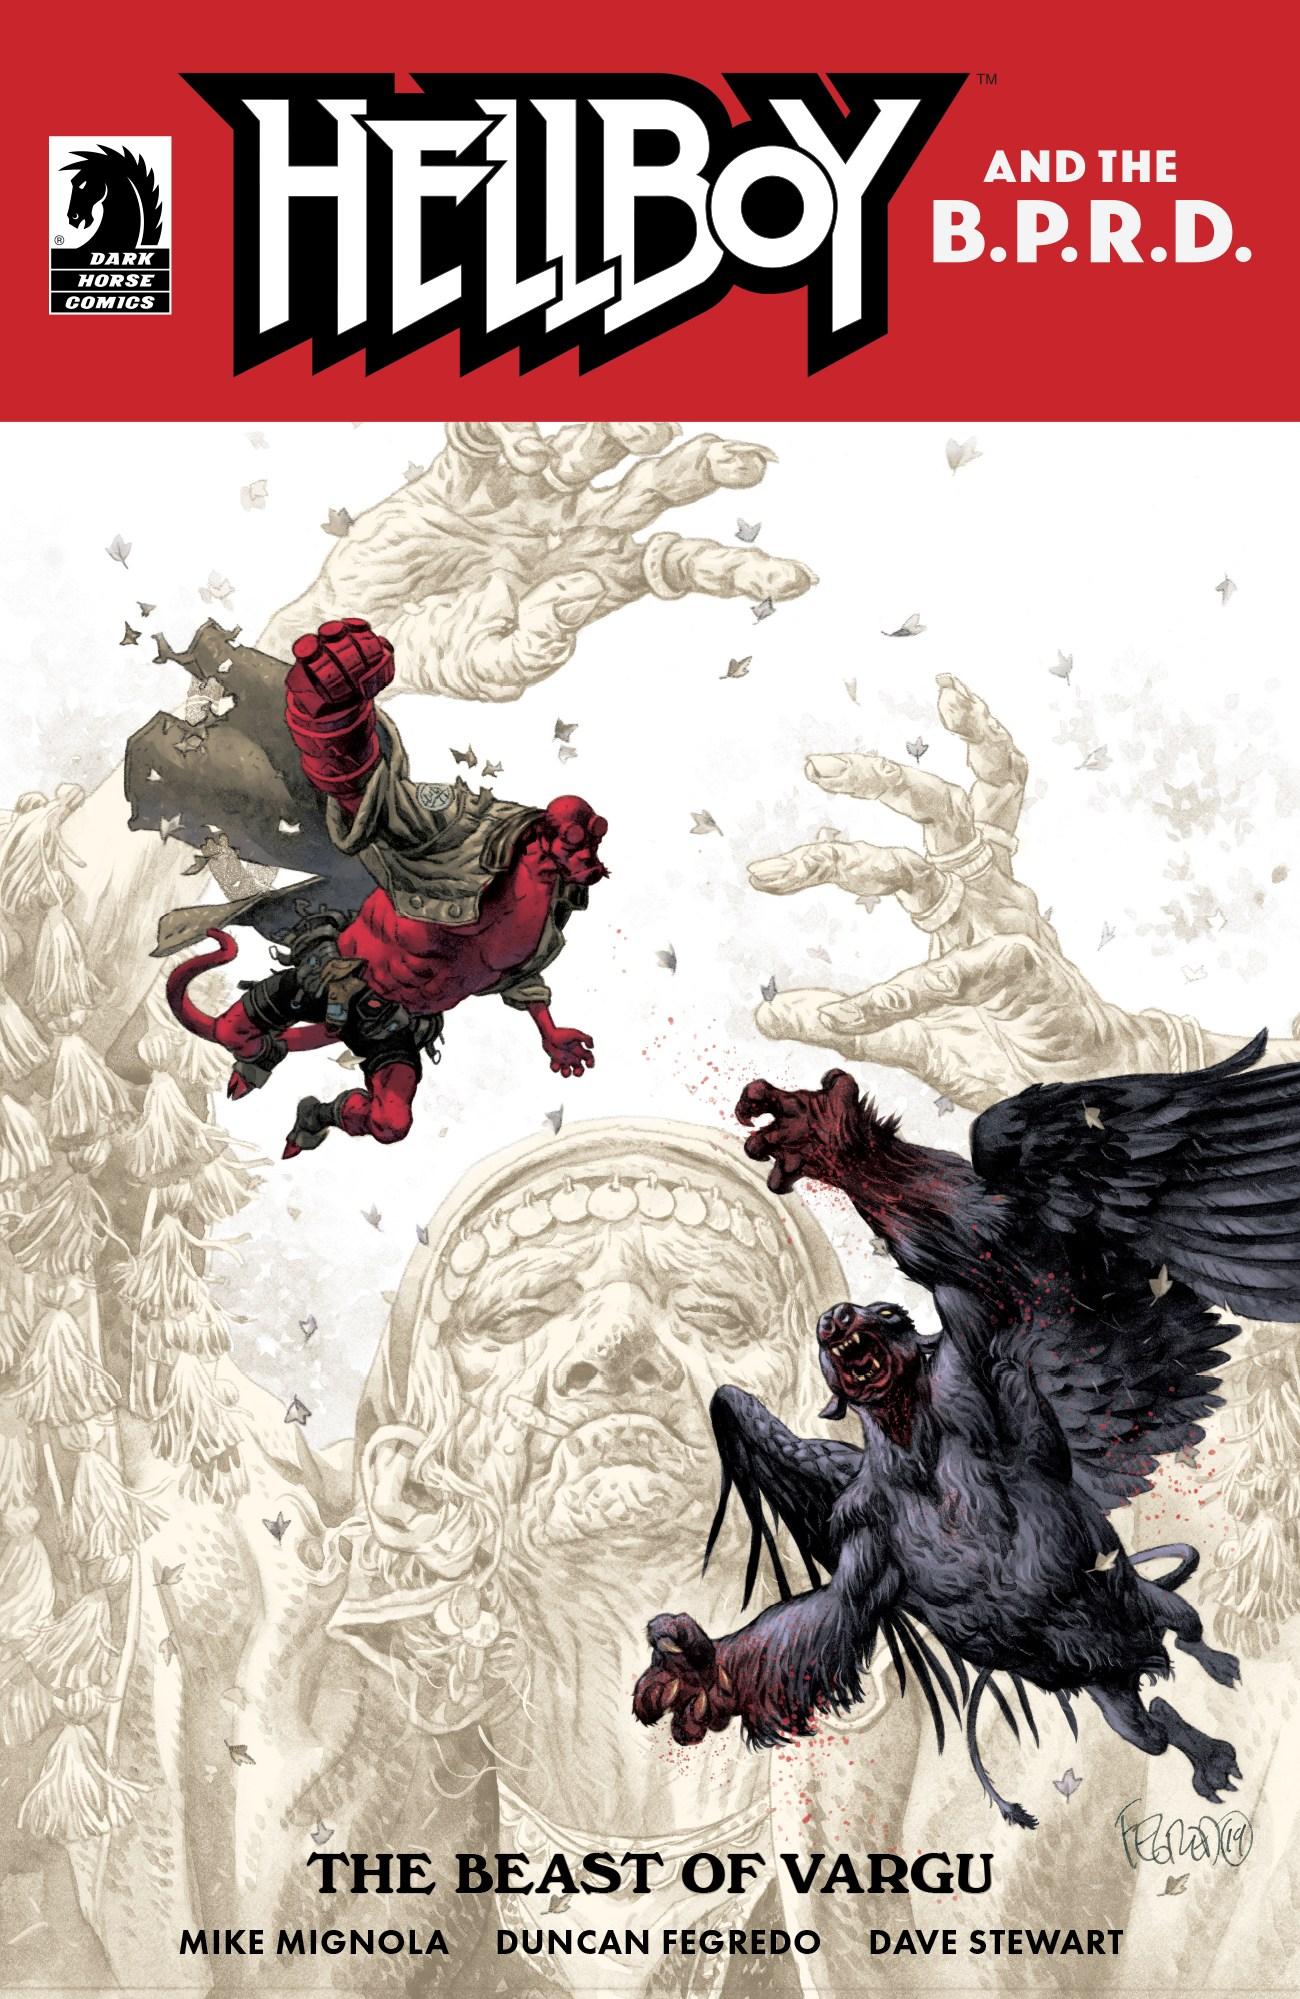 Cover by Duncan Fegredo